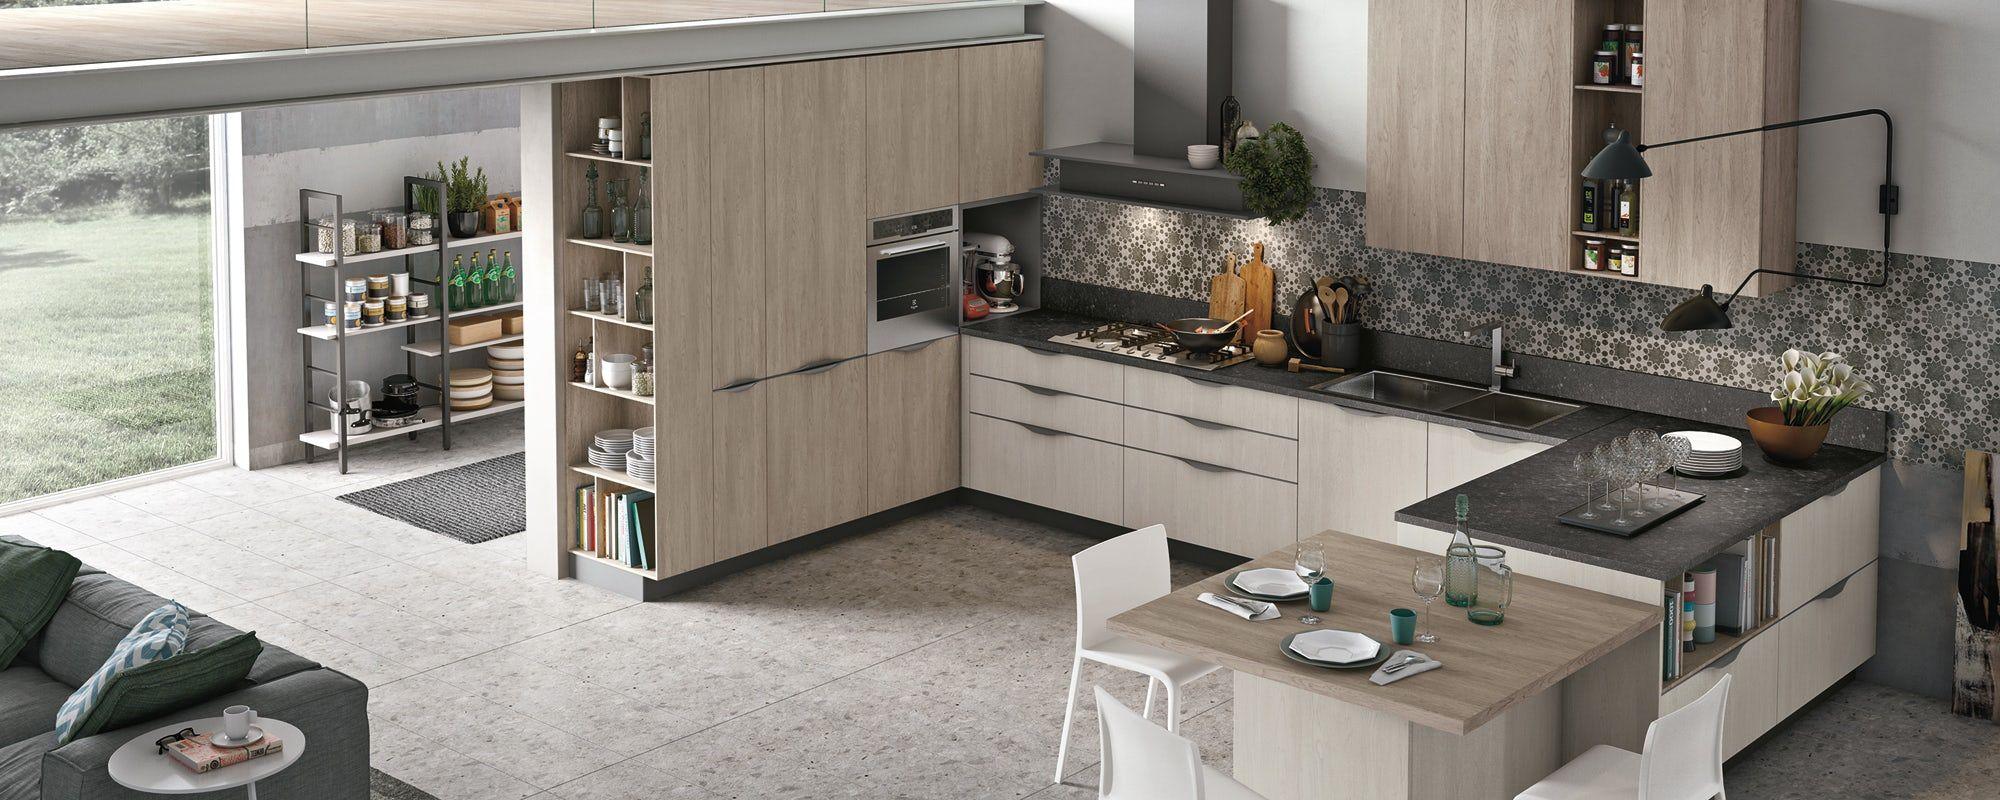 cucine moderne stosa - modello cucina infinity 19 | Cose da comprare ...